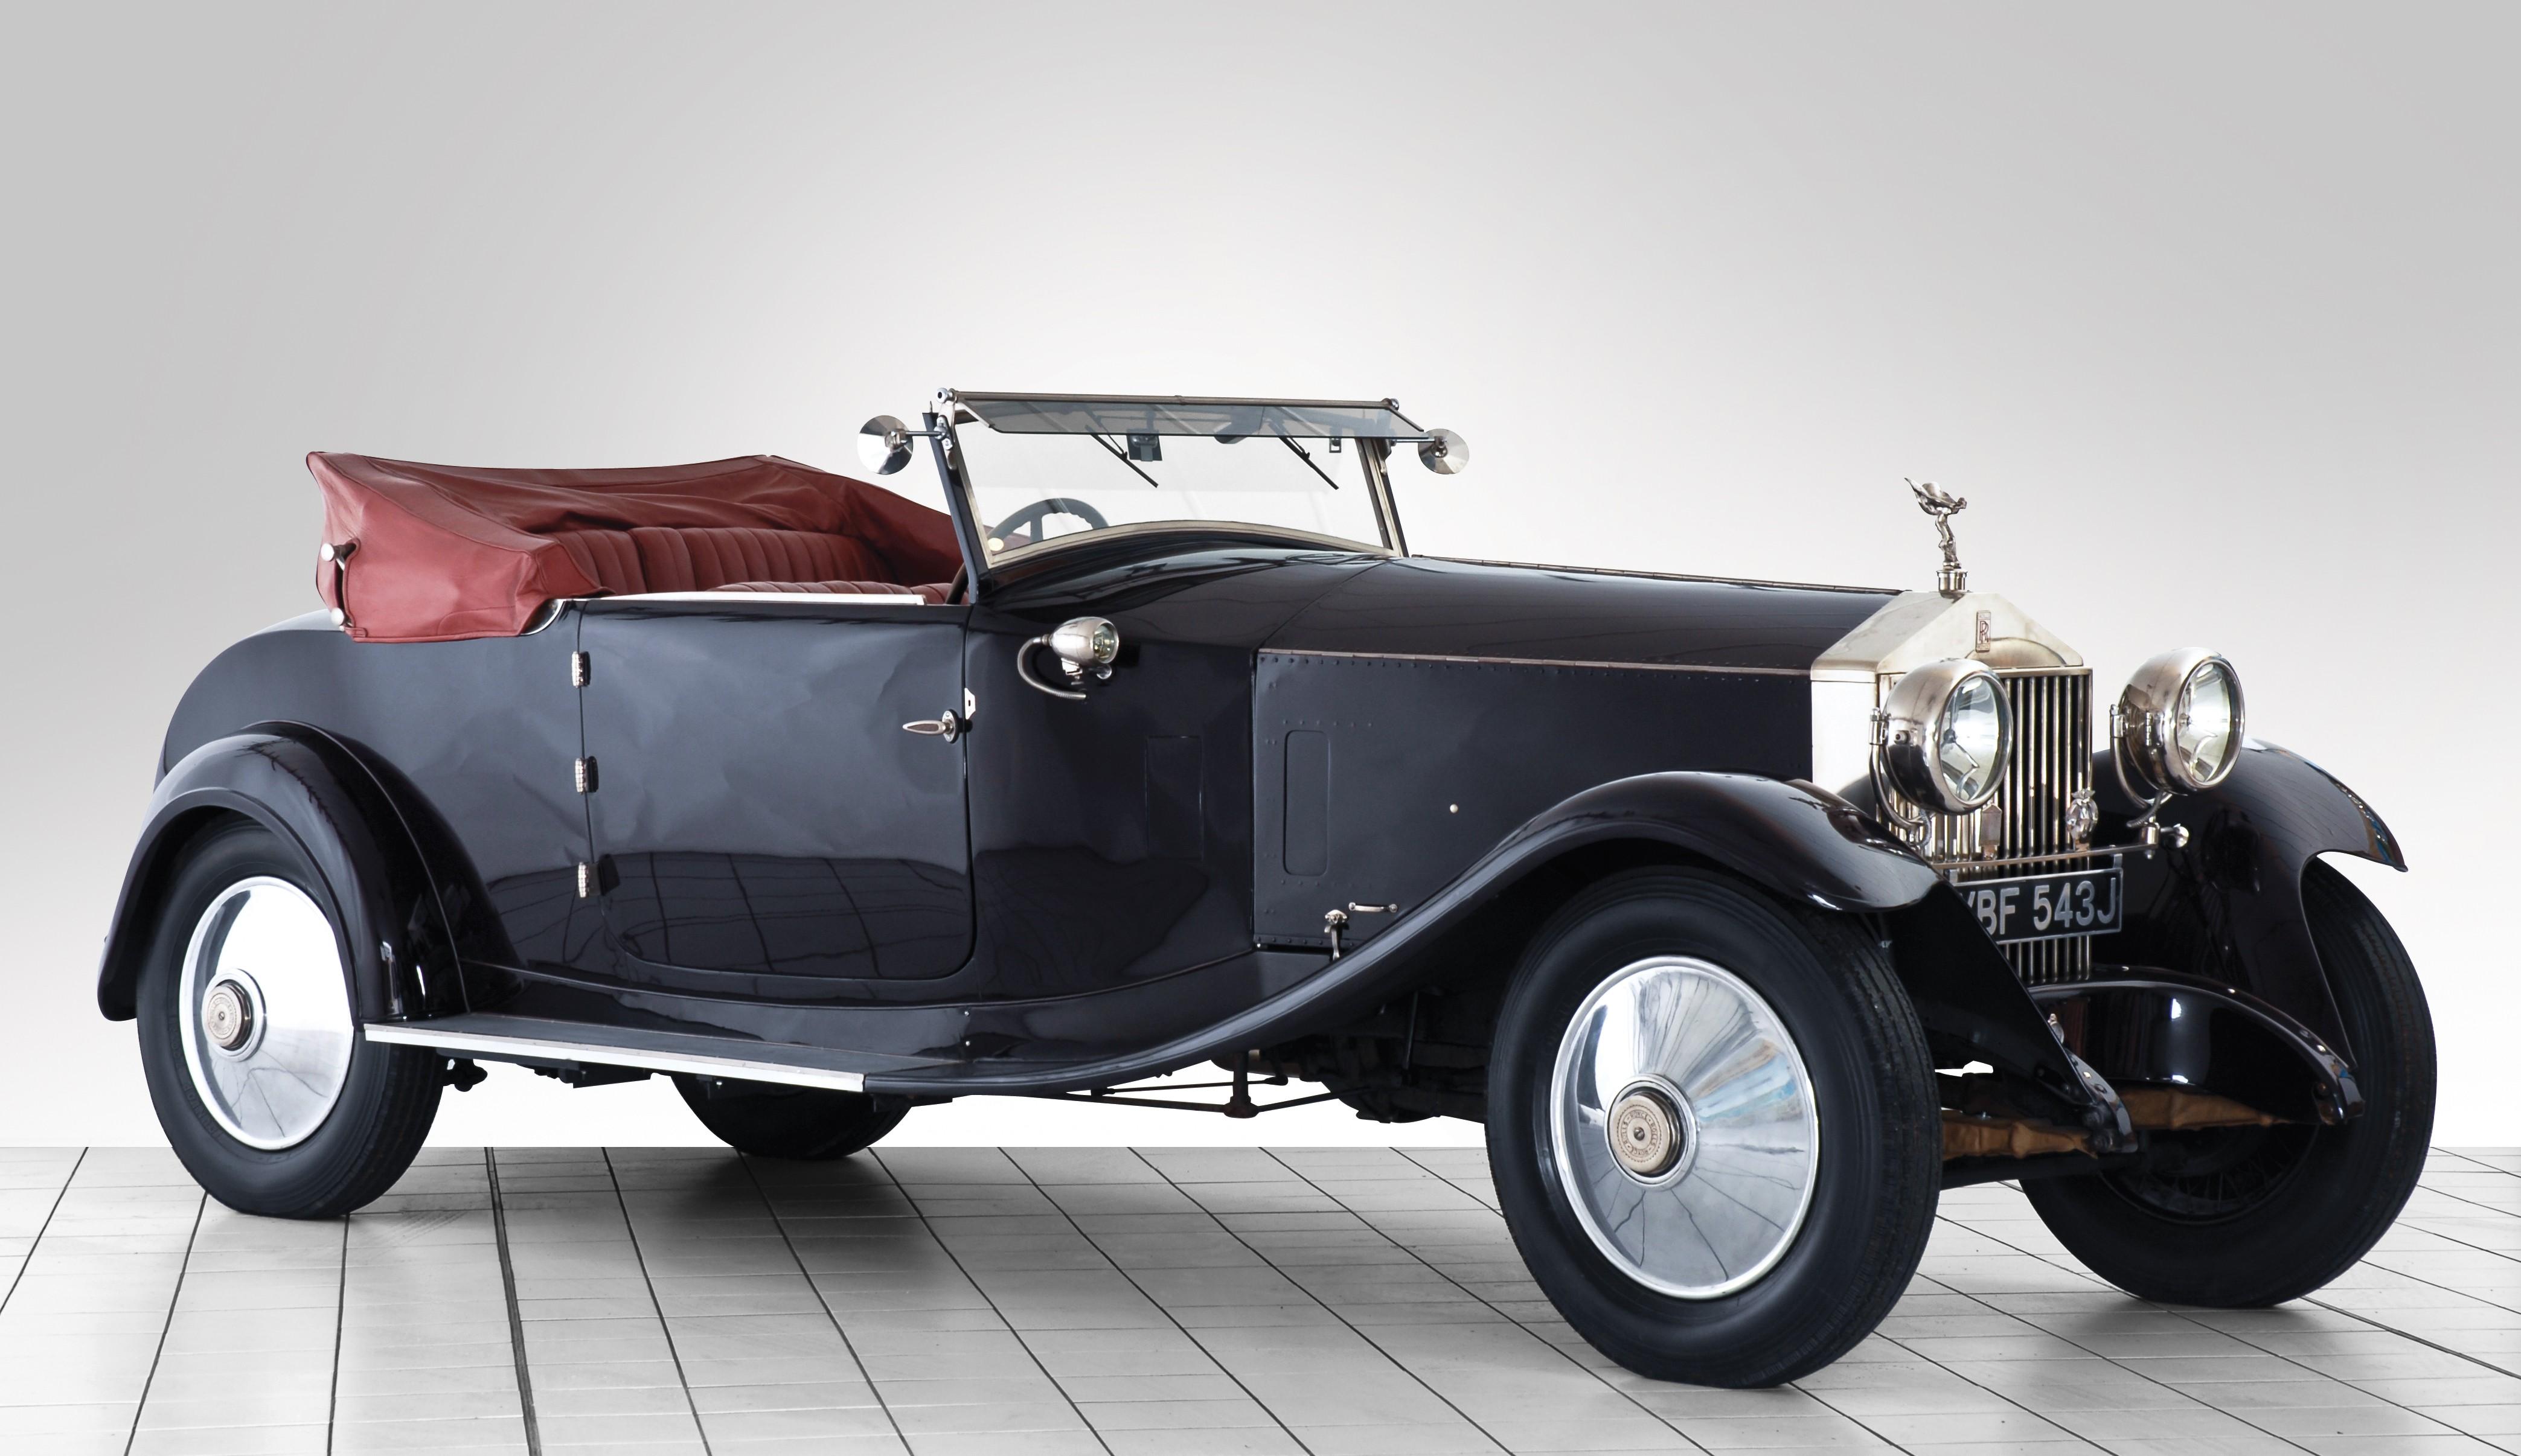 Cars Hd Wallpapers 1080p For Pc Bmw صور سيارات قديمة في اروع خلفيات ورمزيات سيارات تراثية